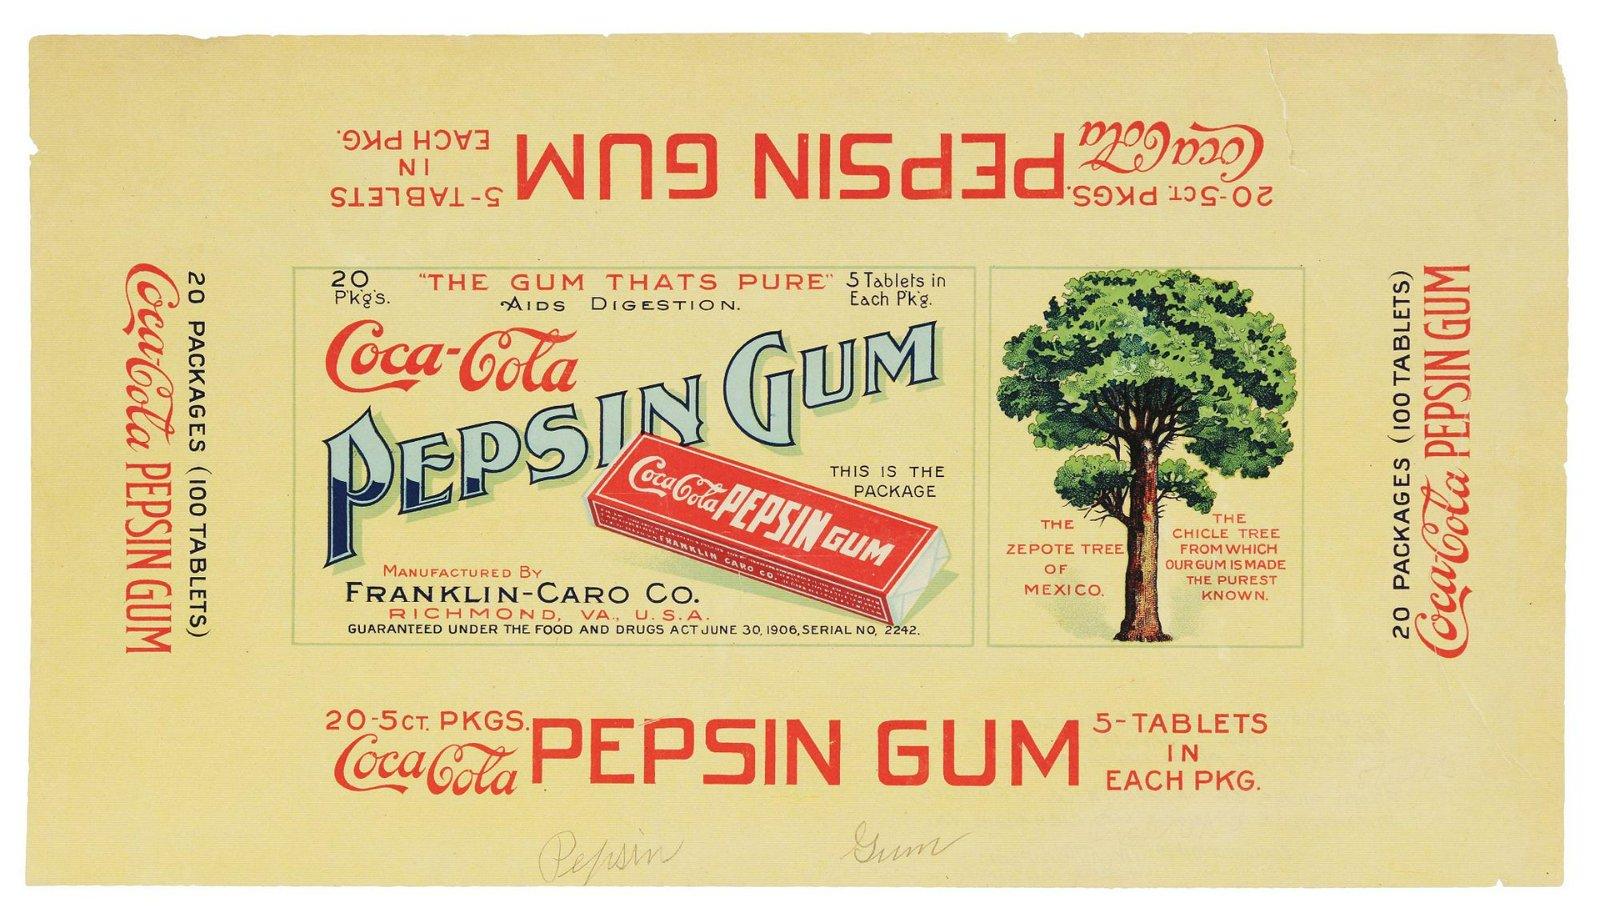 Coca-Cola Chewing Gum Shipping Box Label.